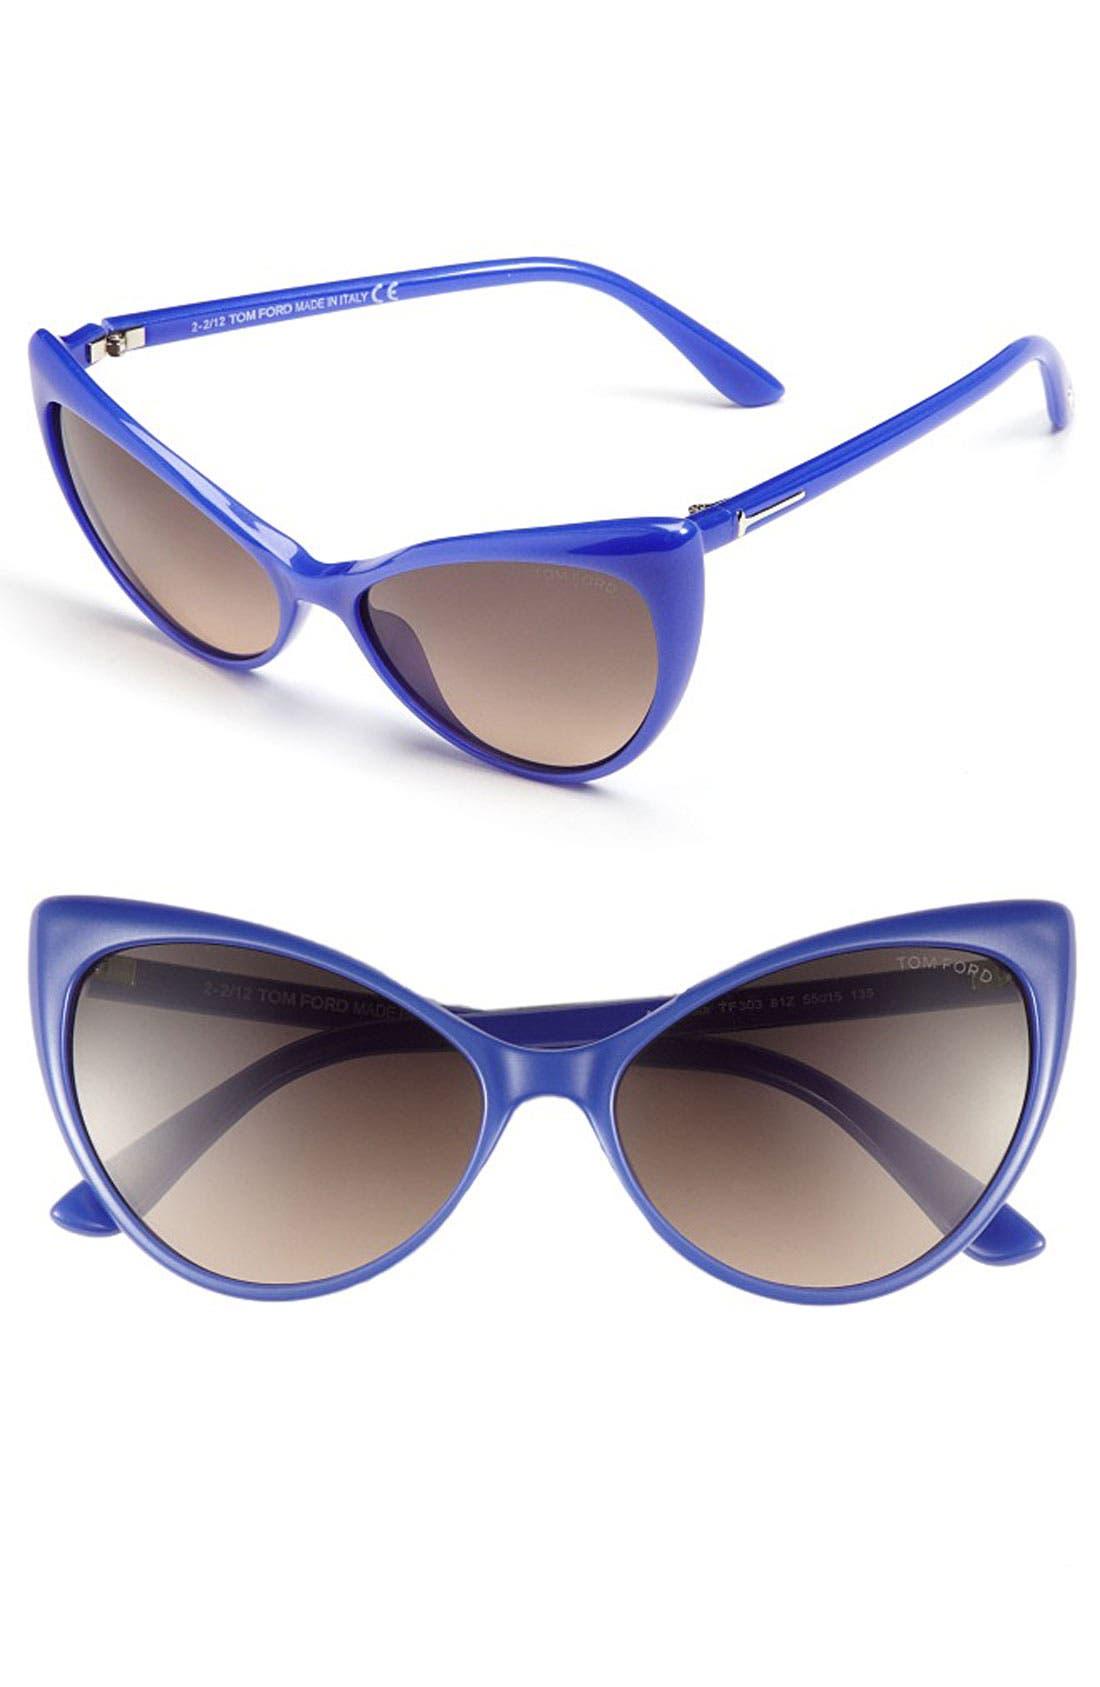 Alternate Image 1 Selected - Tom Ford 'Anastasia' 55mm Retro Sunglasses